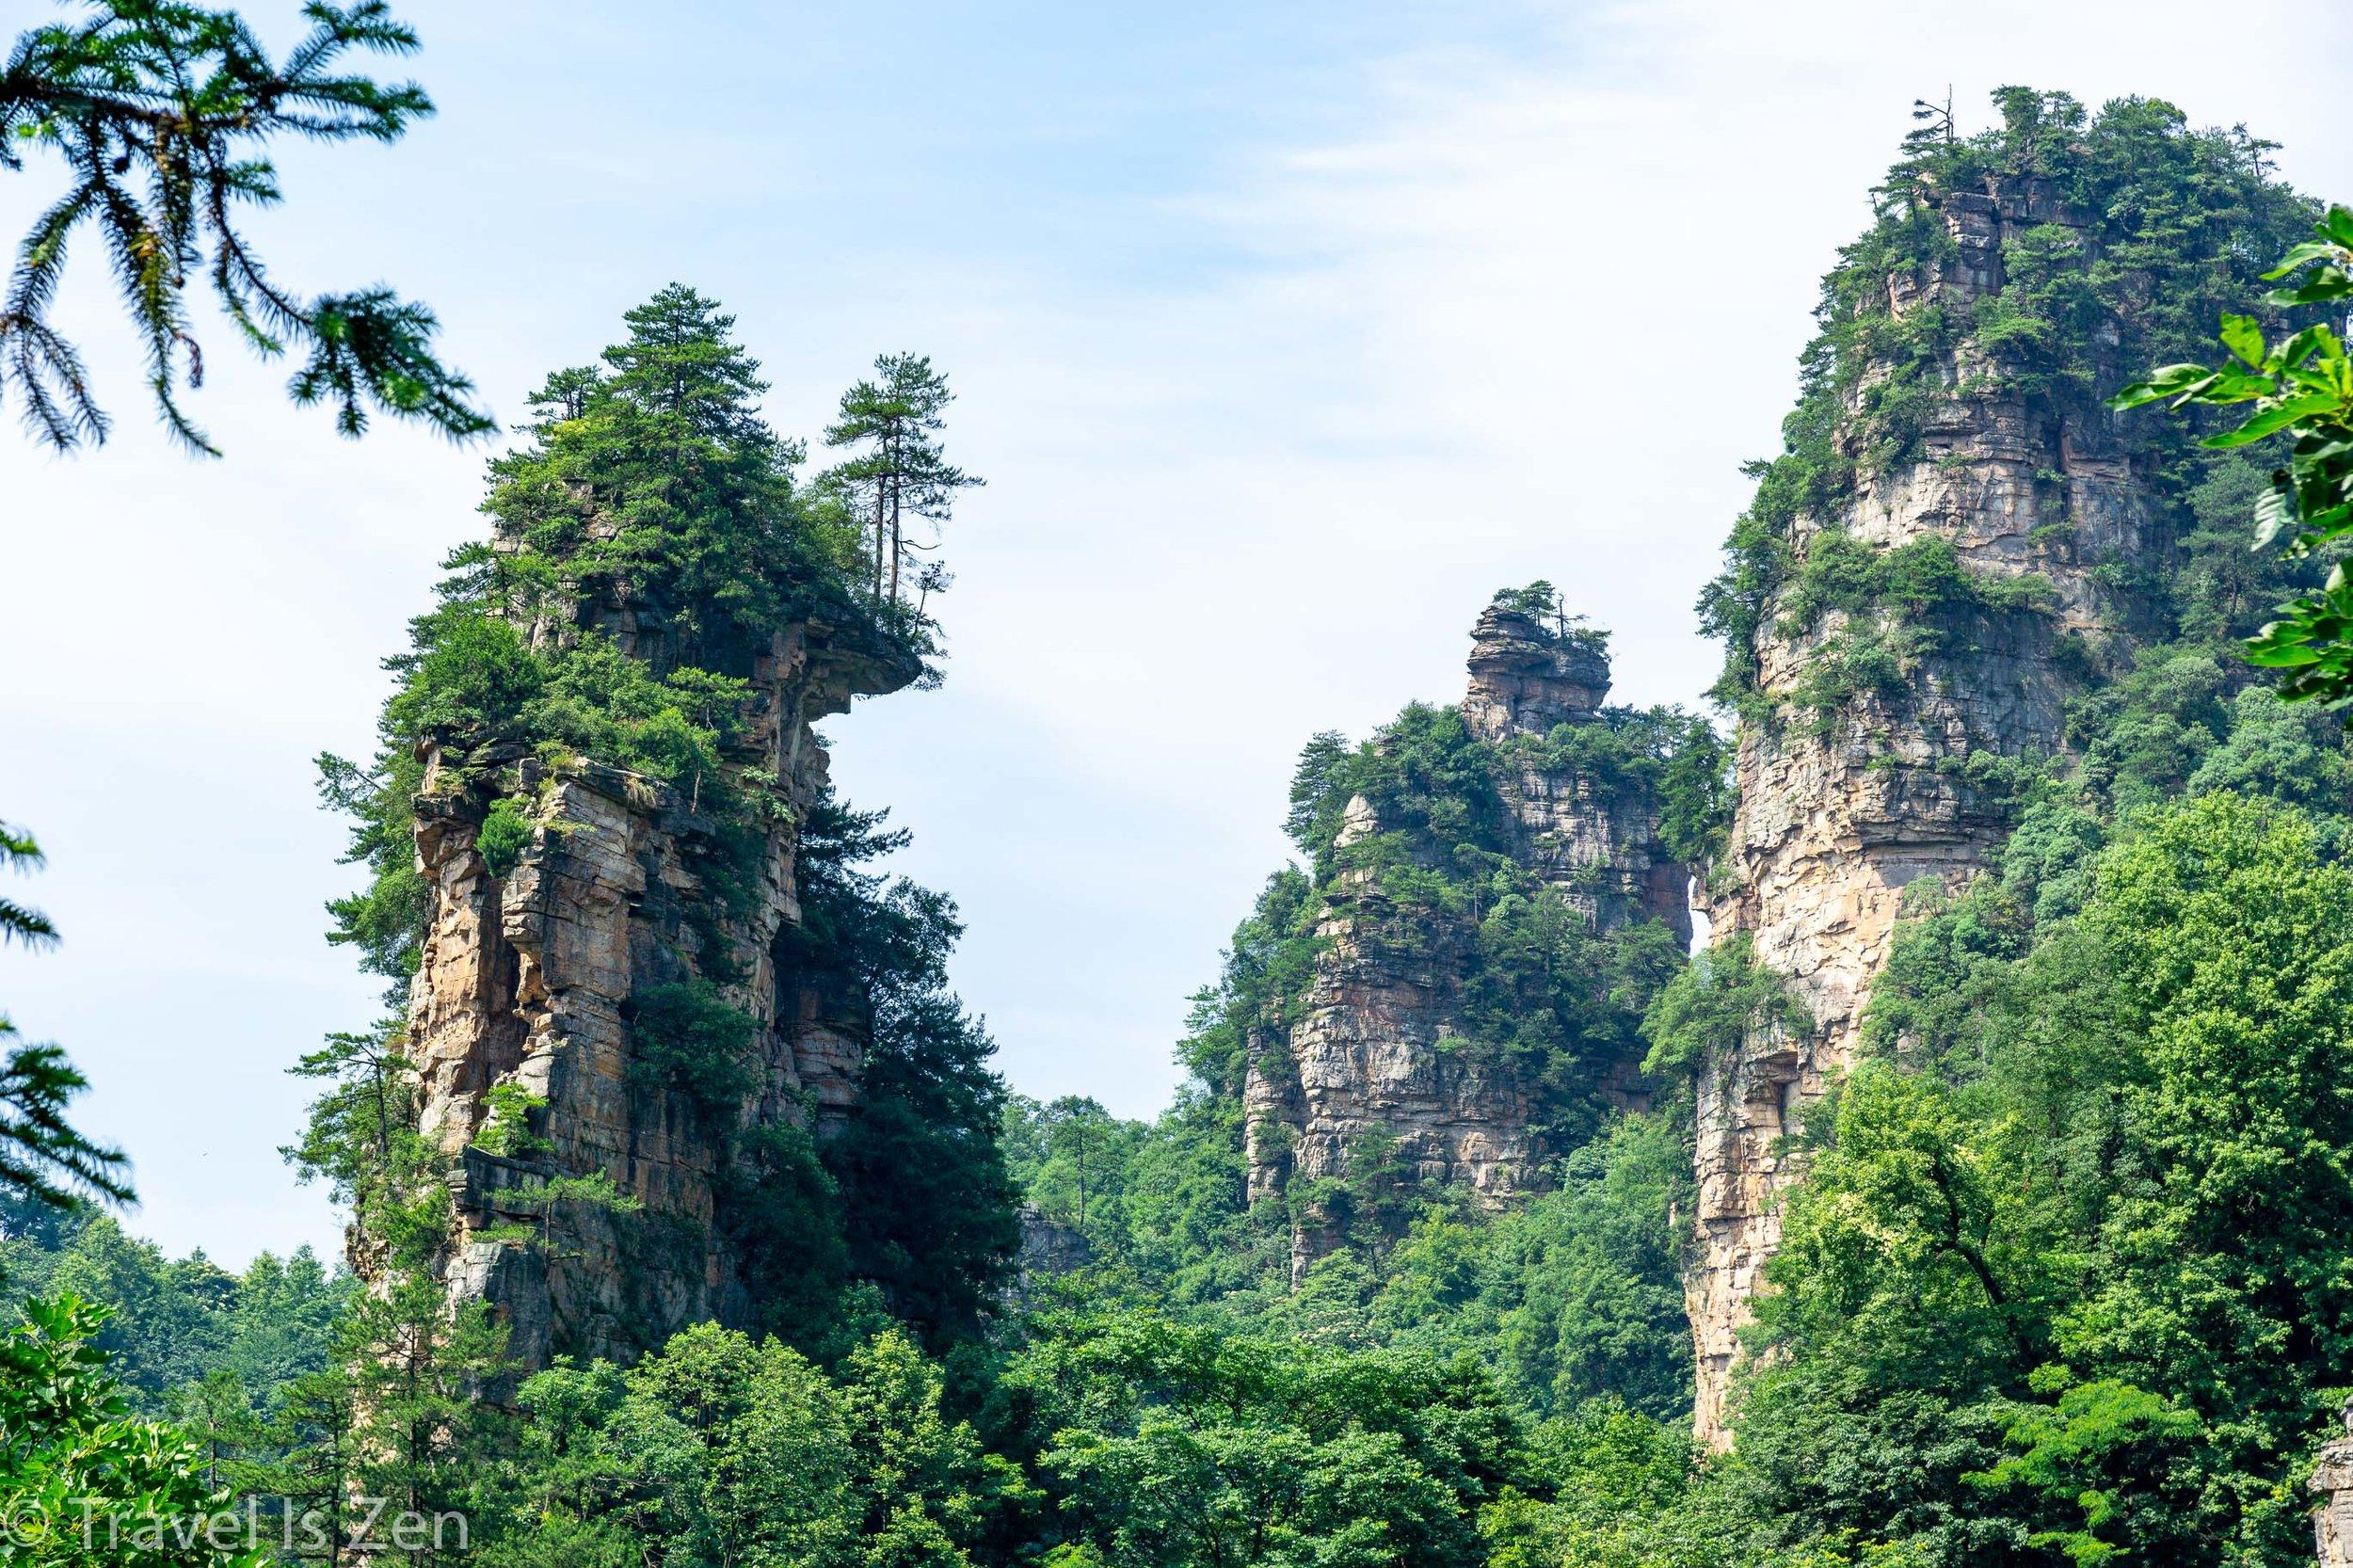 Tianzi Mountain (天子山), Yangjiajie Scenic Area